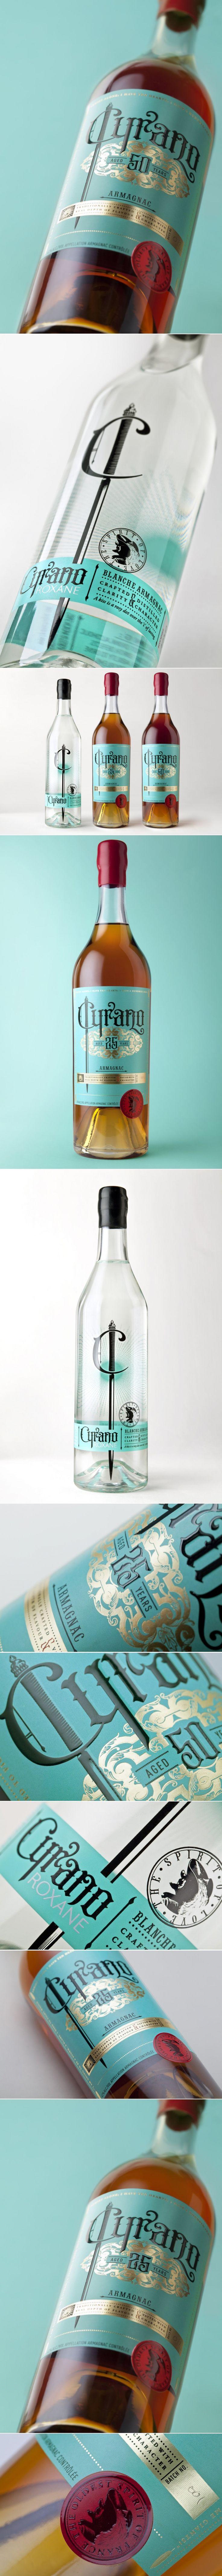 Drink Up the Oldest Spirit of France: Cyrano Armagnac — The Dieline - Branding & Packaging Design